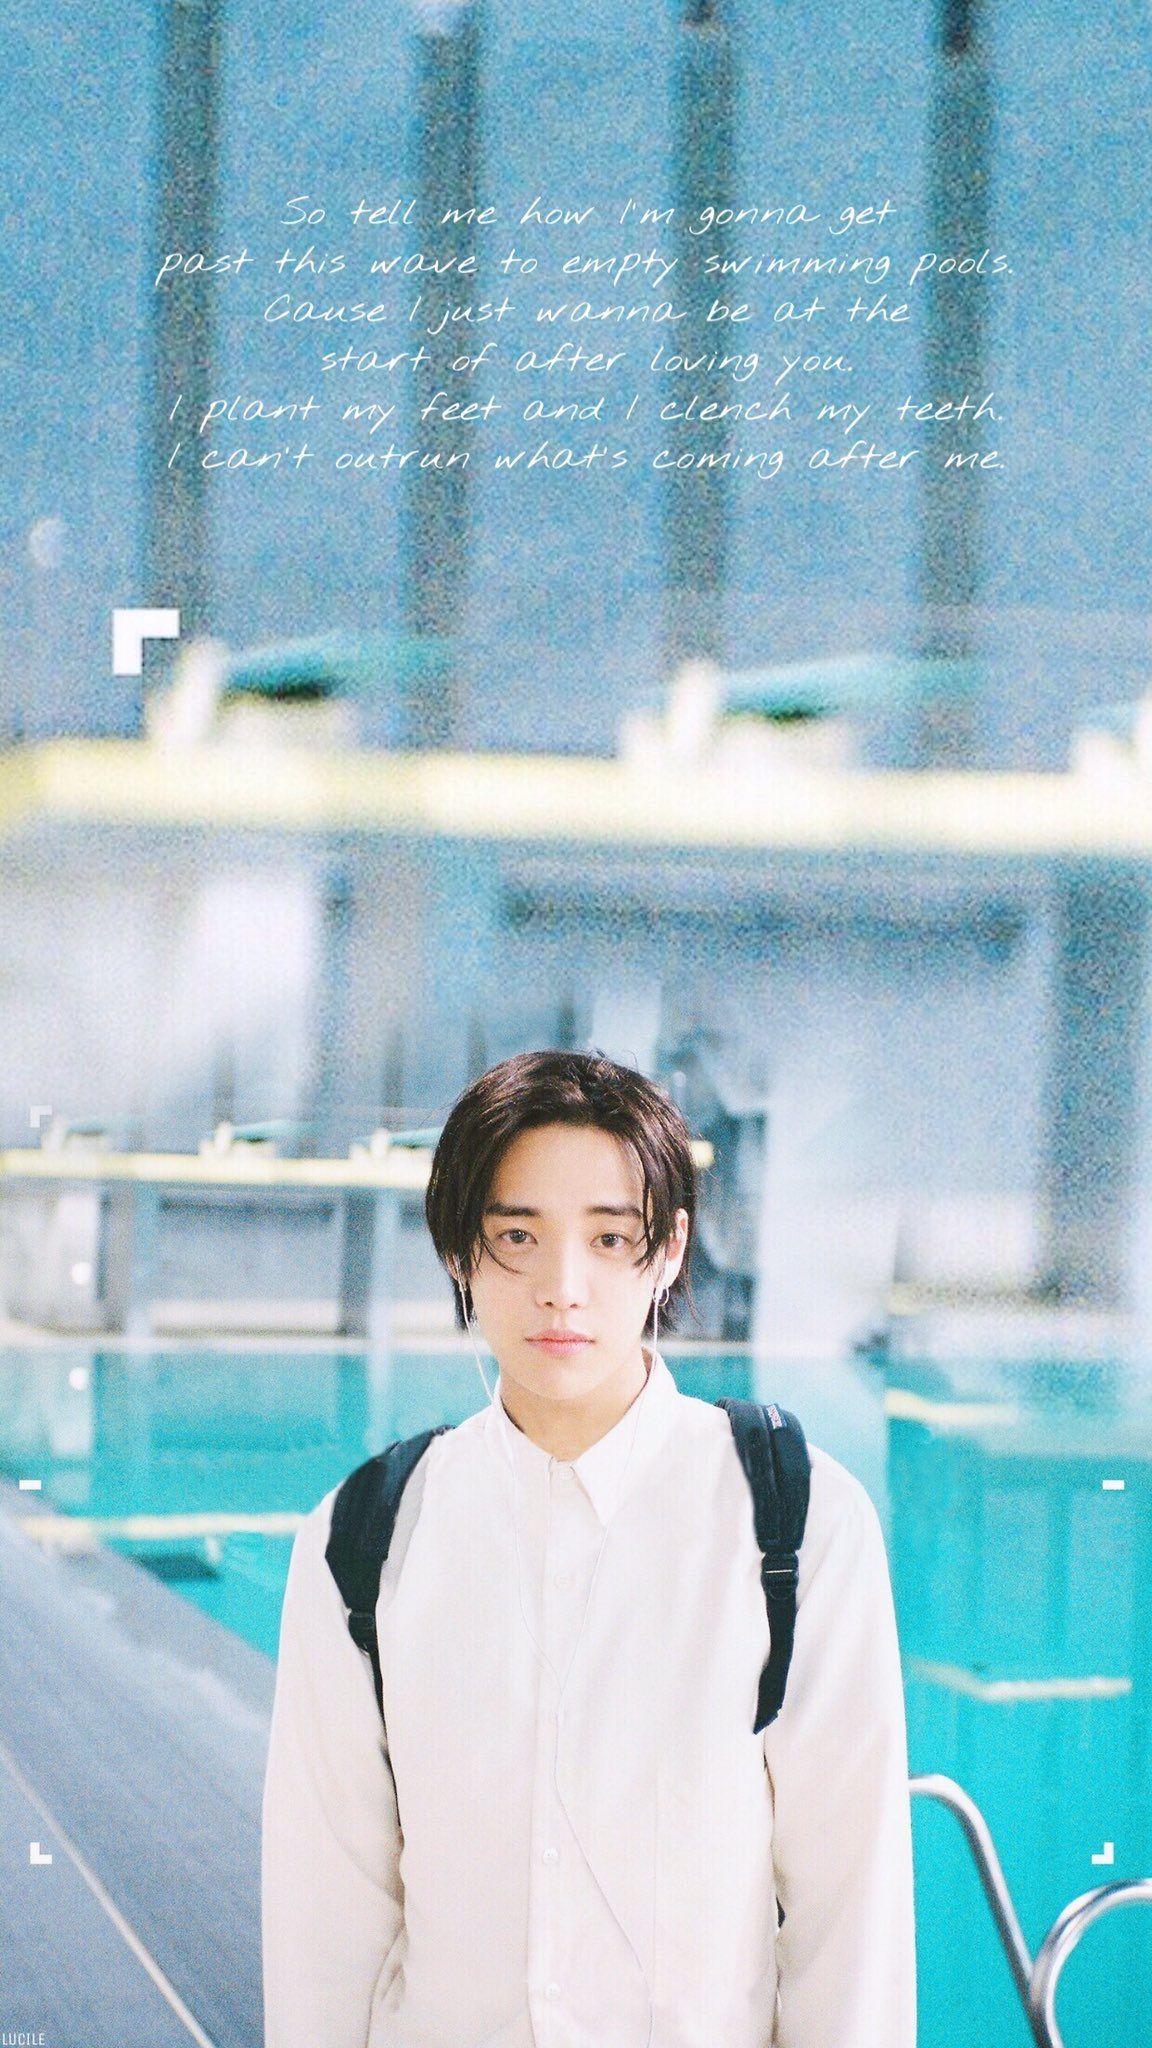 Yg One Jaewon Wallpaper Di 2019